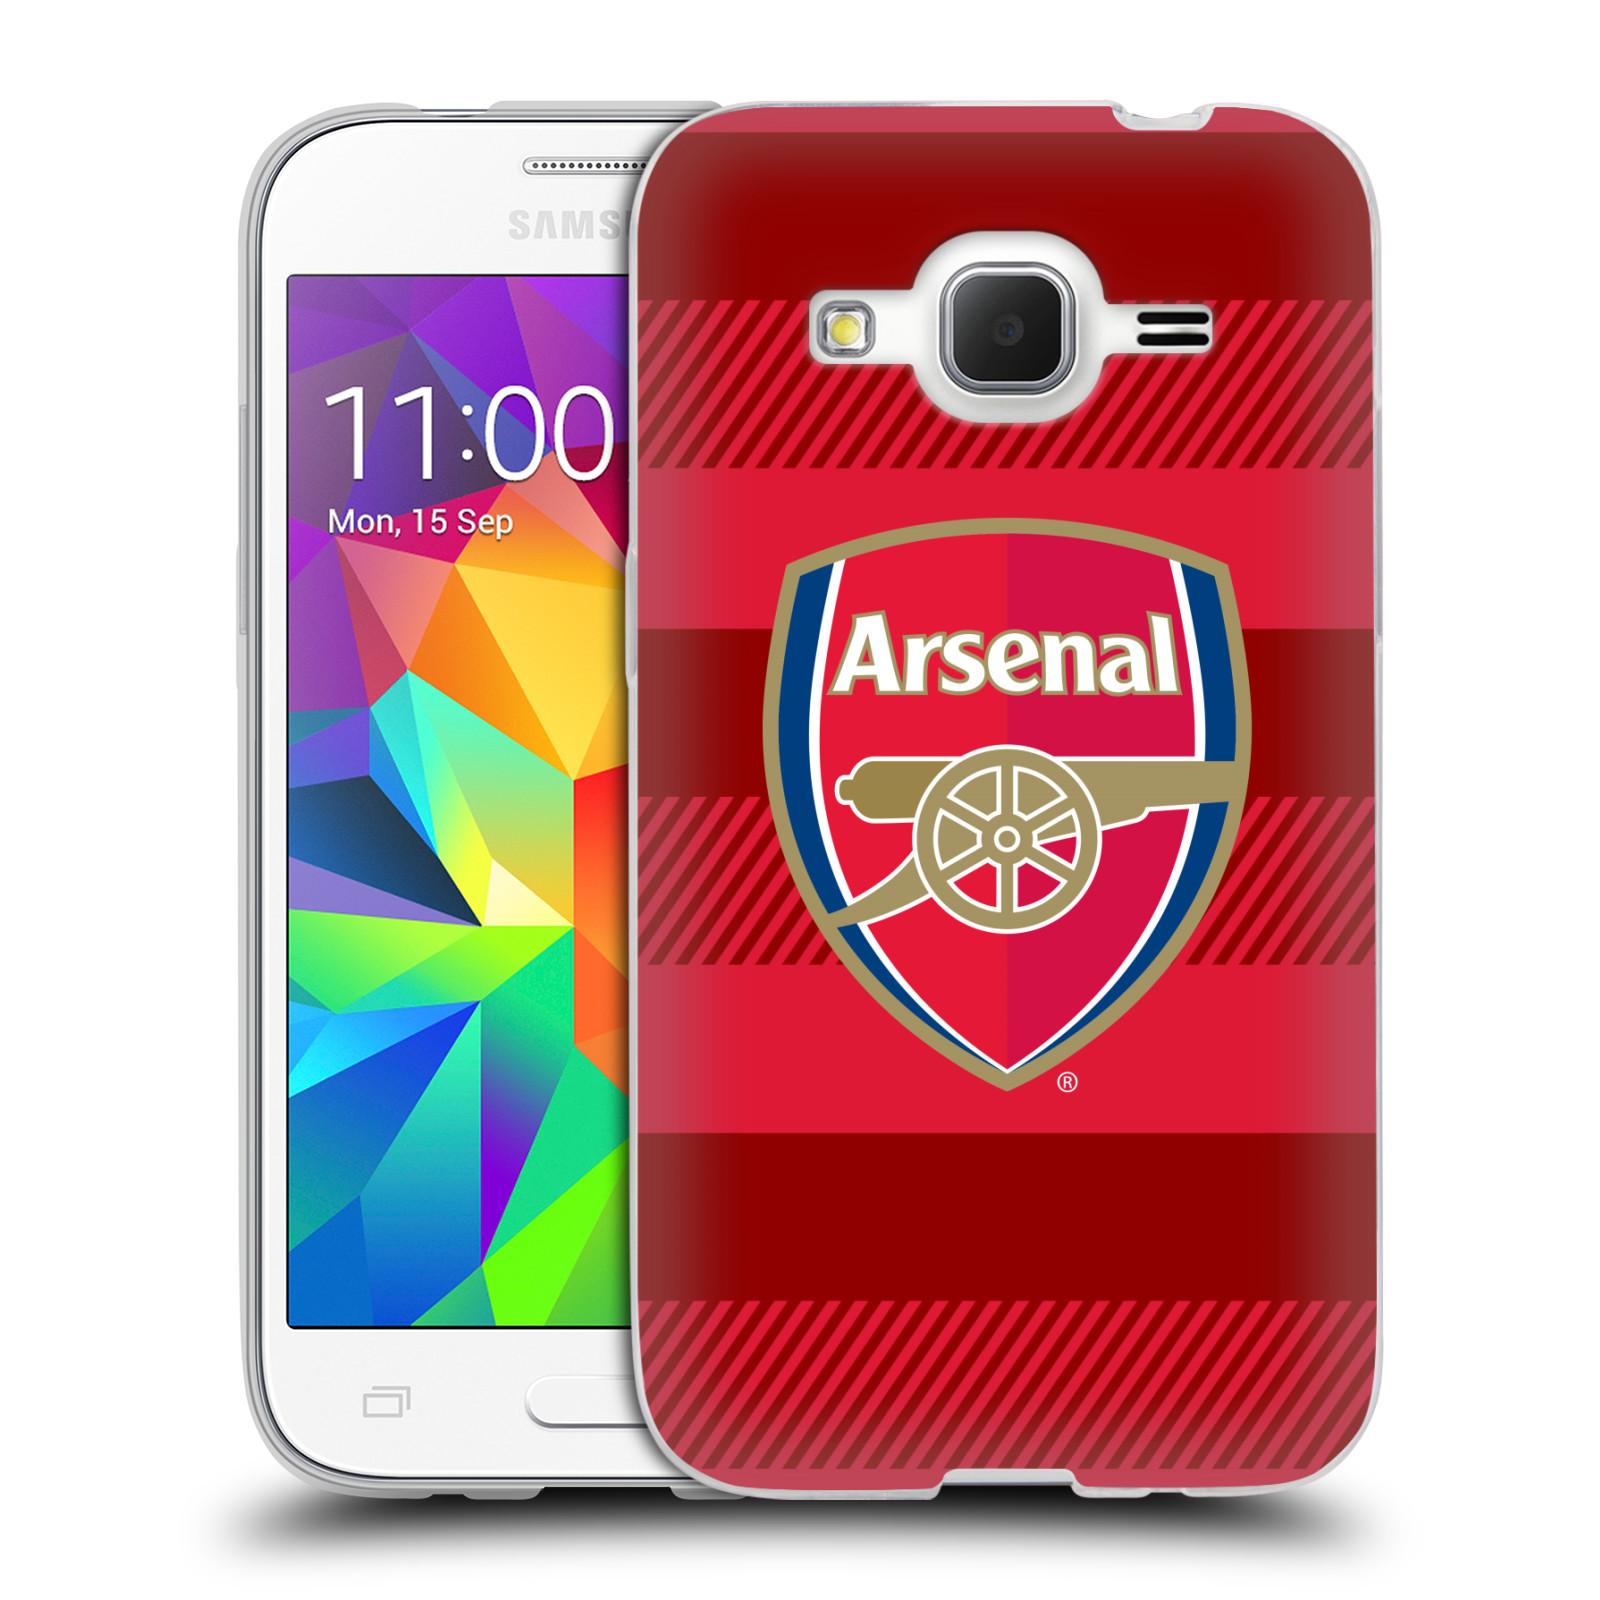 Silikonové pouzdro na mobil Samsung Galaxy Core Prime LTE - Head Case - Arsenal FC - Logo s pruhy